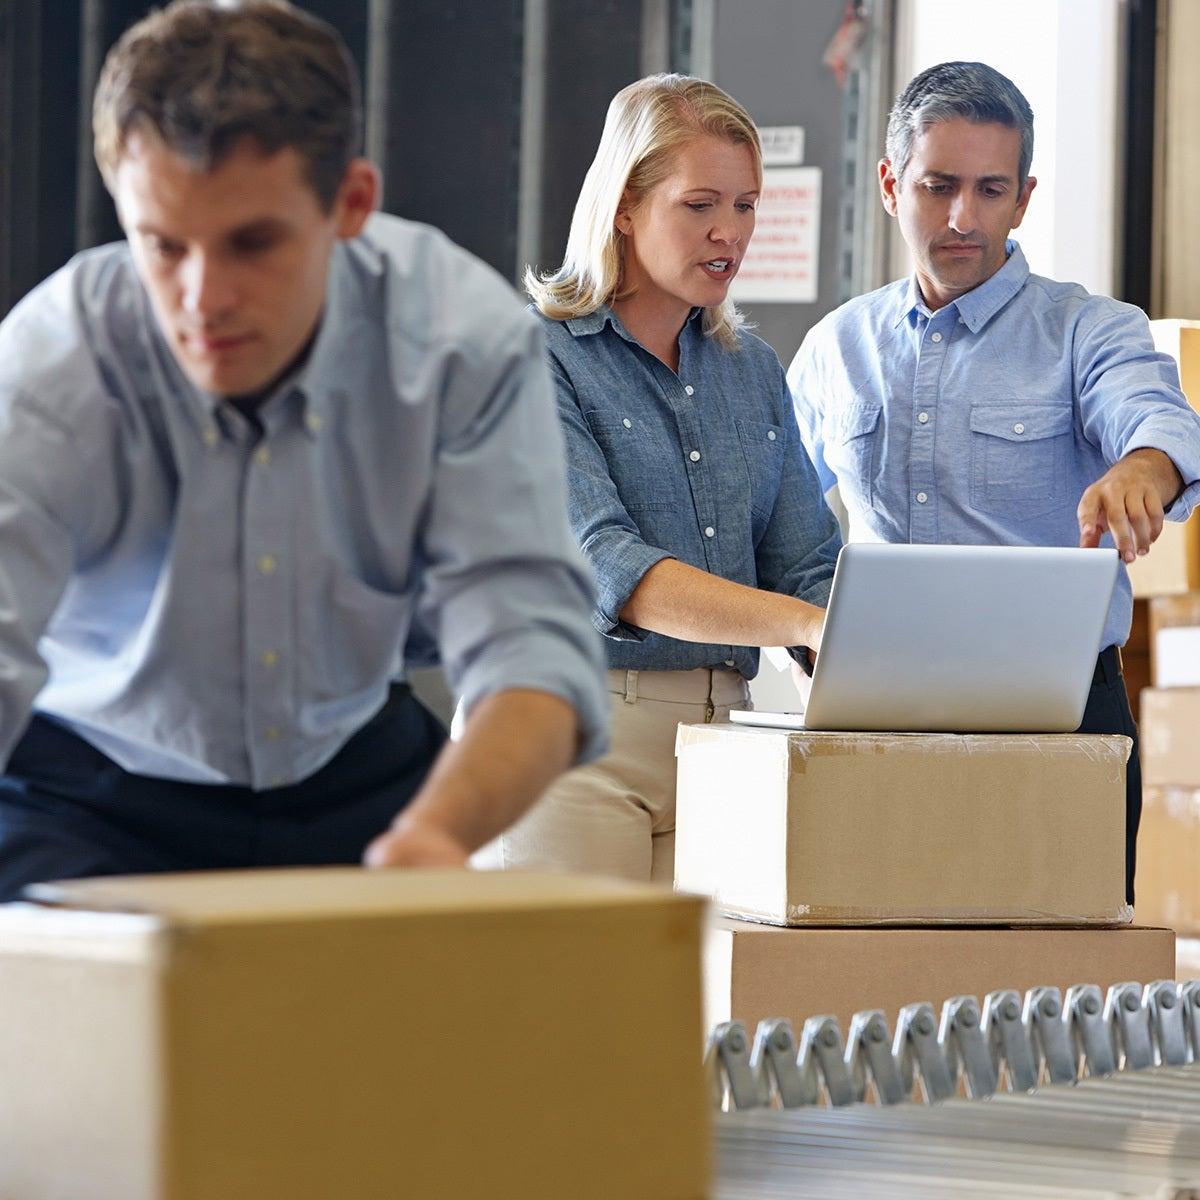 logistics management salary - HD1200×1200